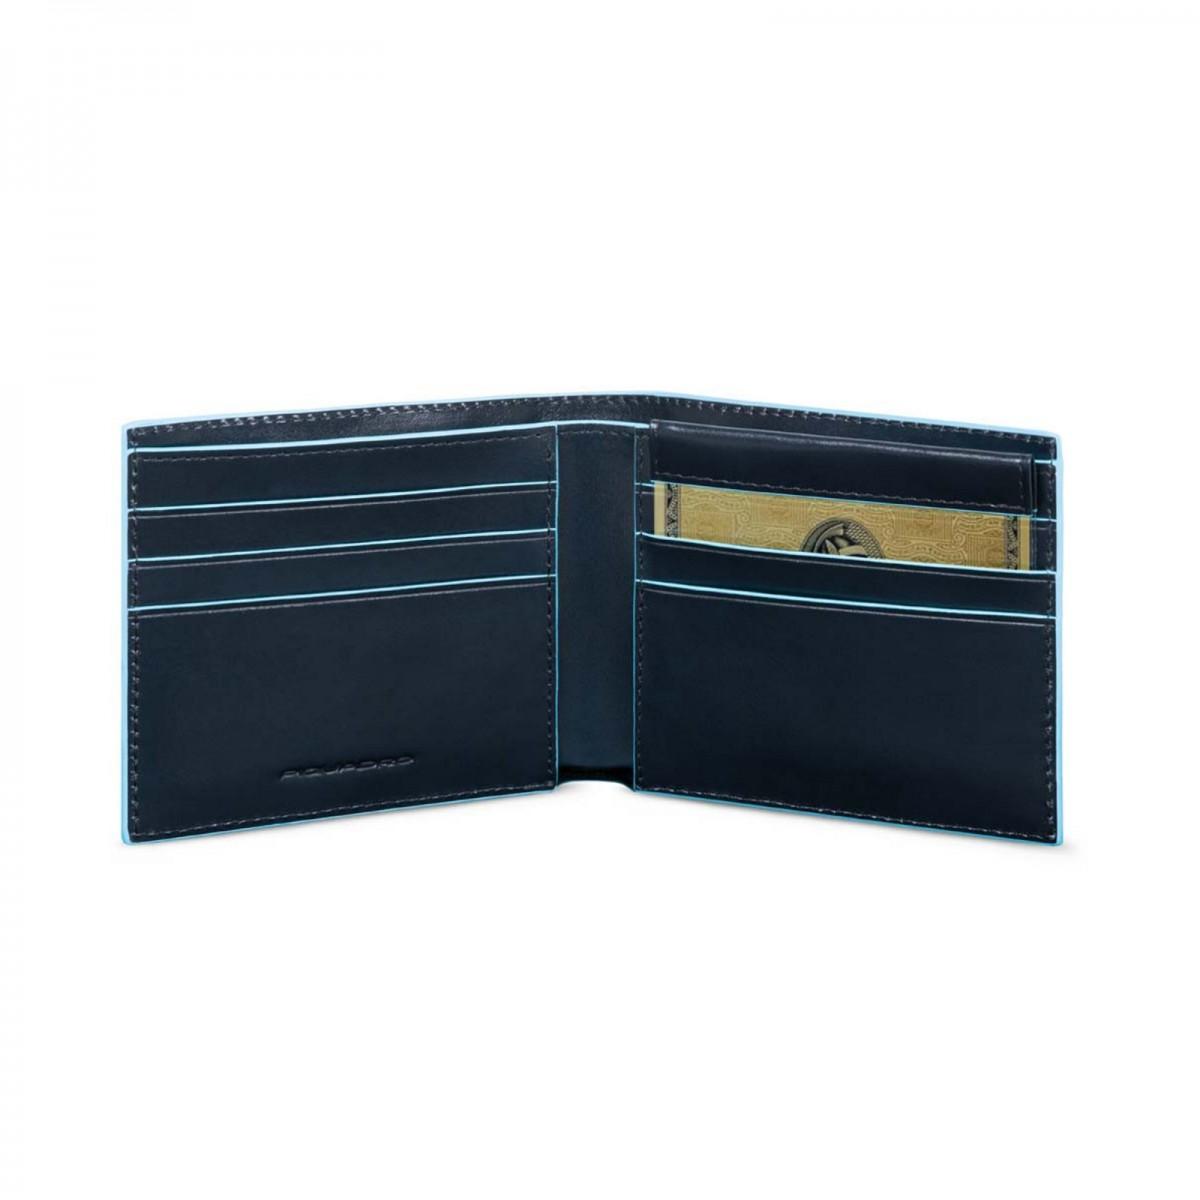 PIQUADRO Blue Square portafogli uomo 6 cc, RFID, pelle blu